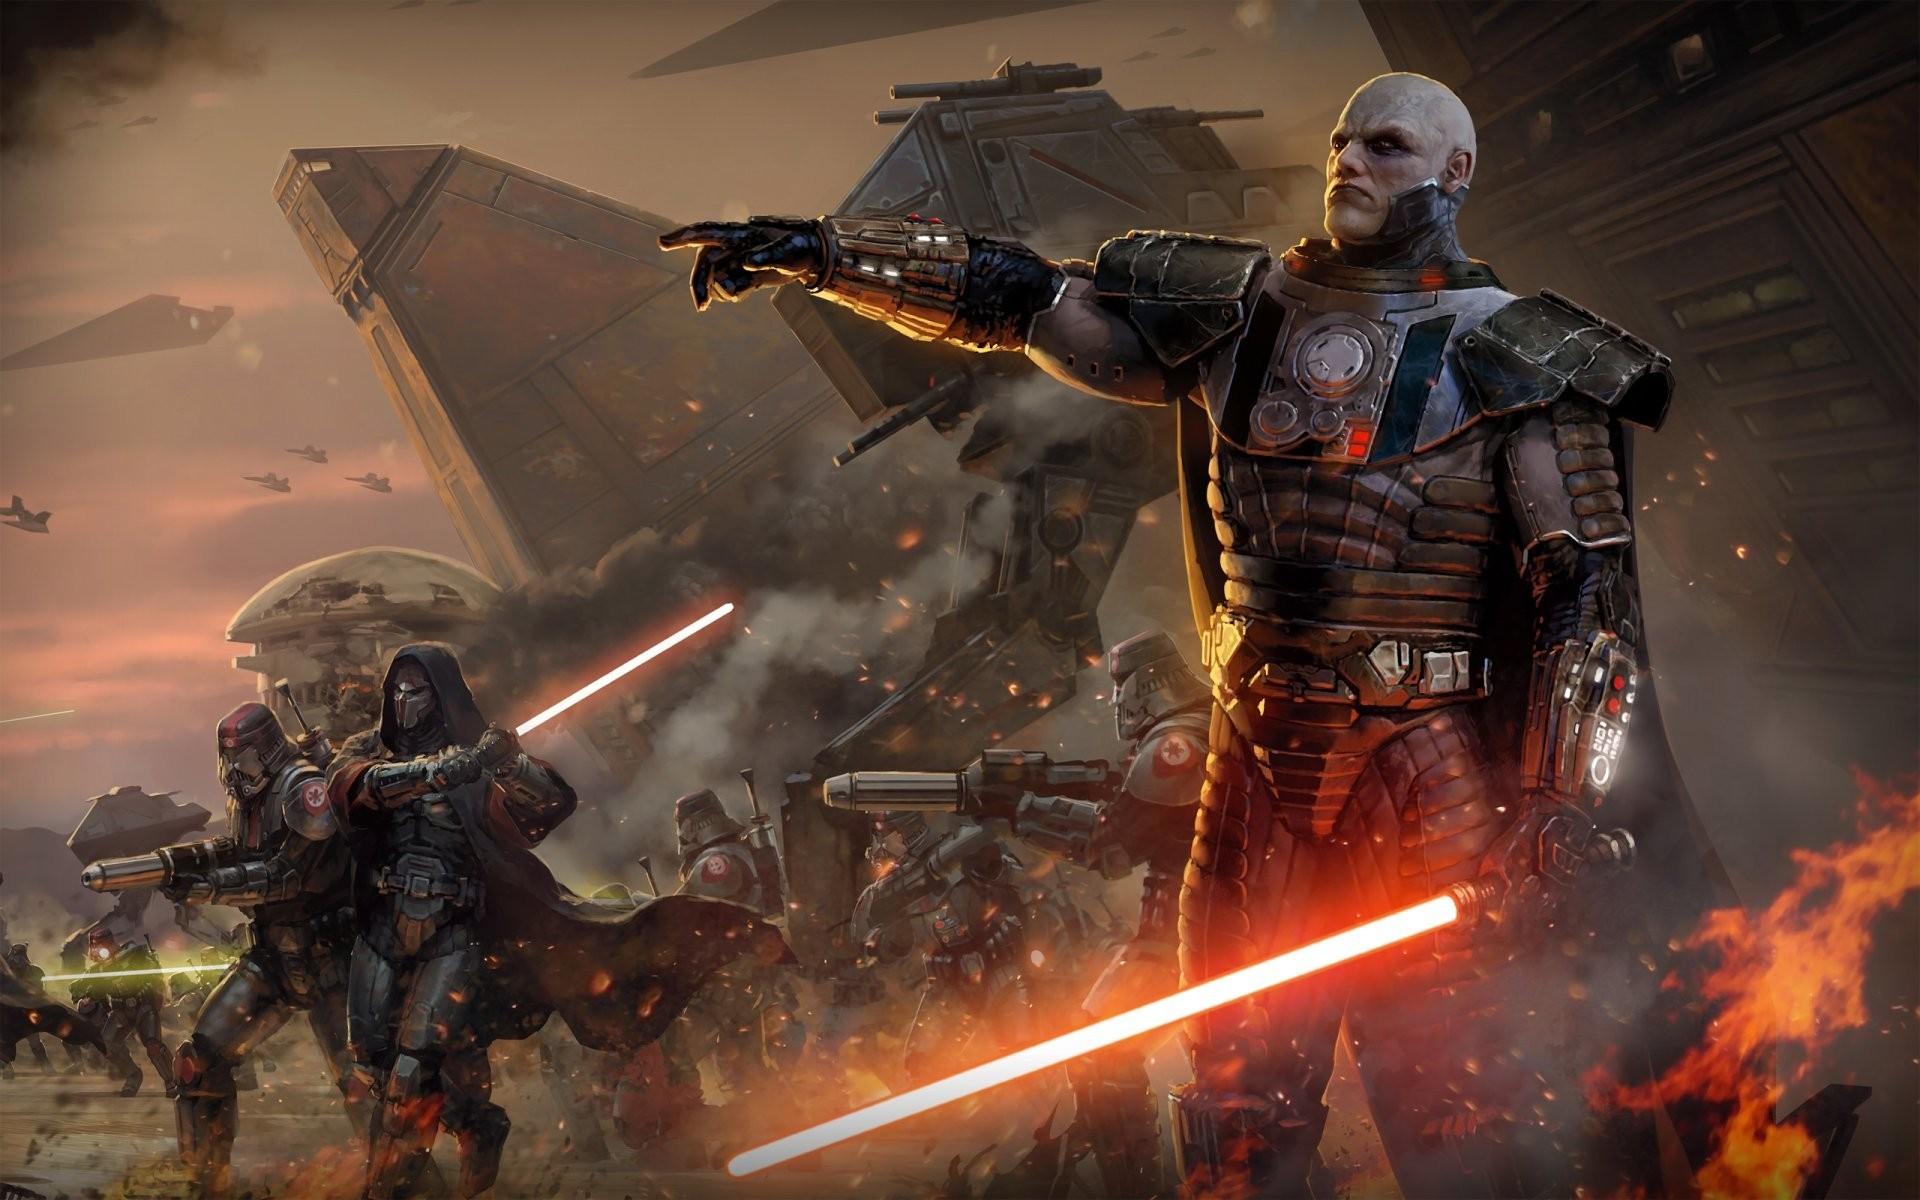 Star Wars Art Wallpapers 5